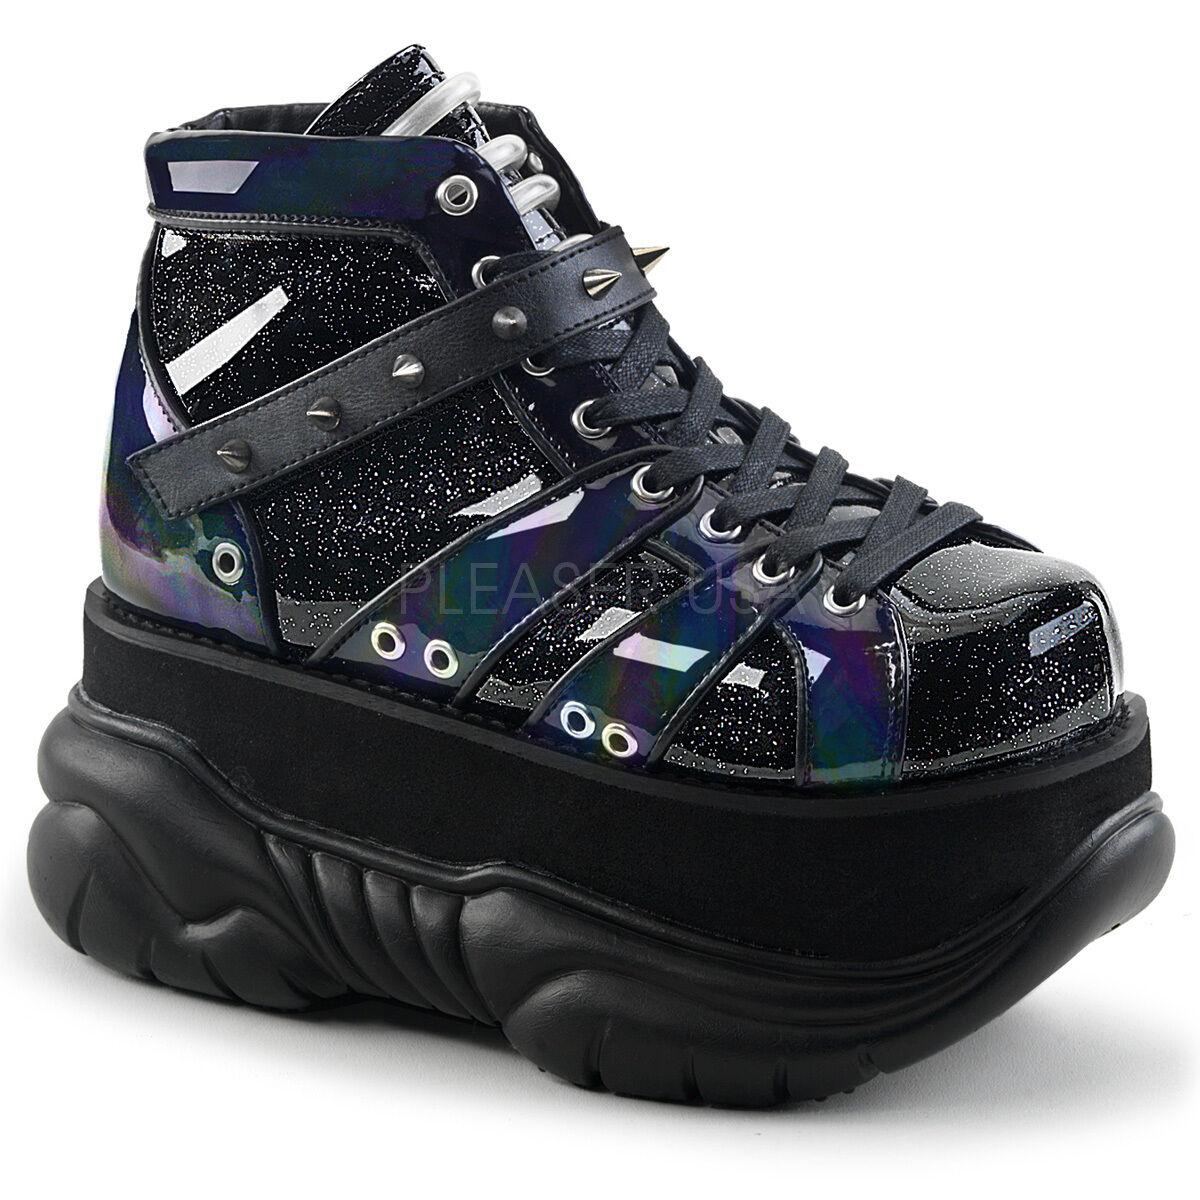 Black Blue Demonia Cyber Cyber Demonia Rave Festival Shoes Platform Sneaker Boots Womans 7 8 9 ba4273